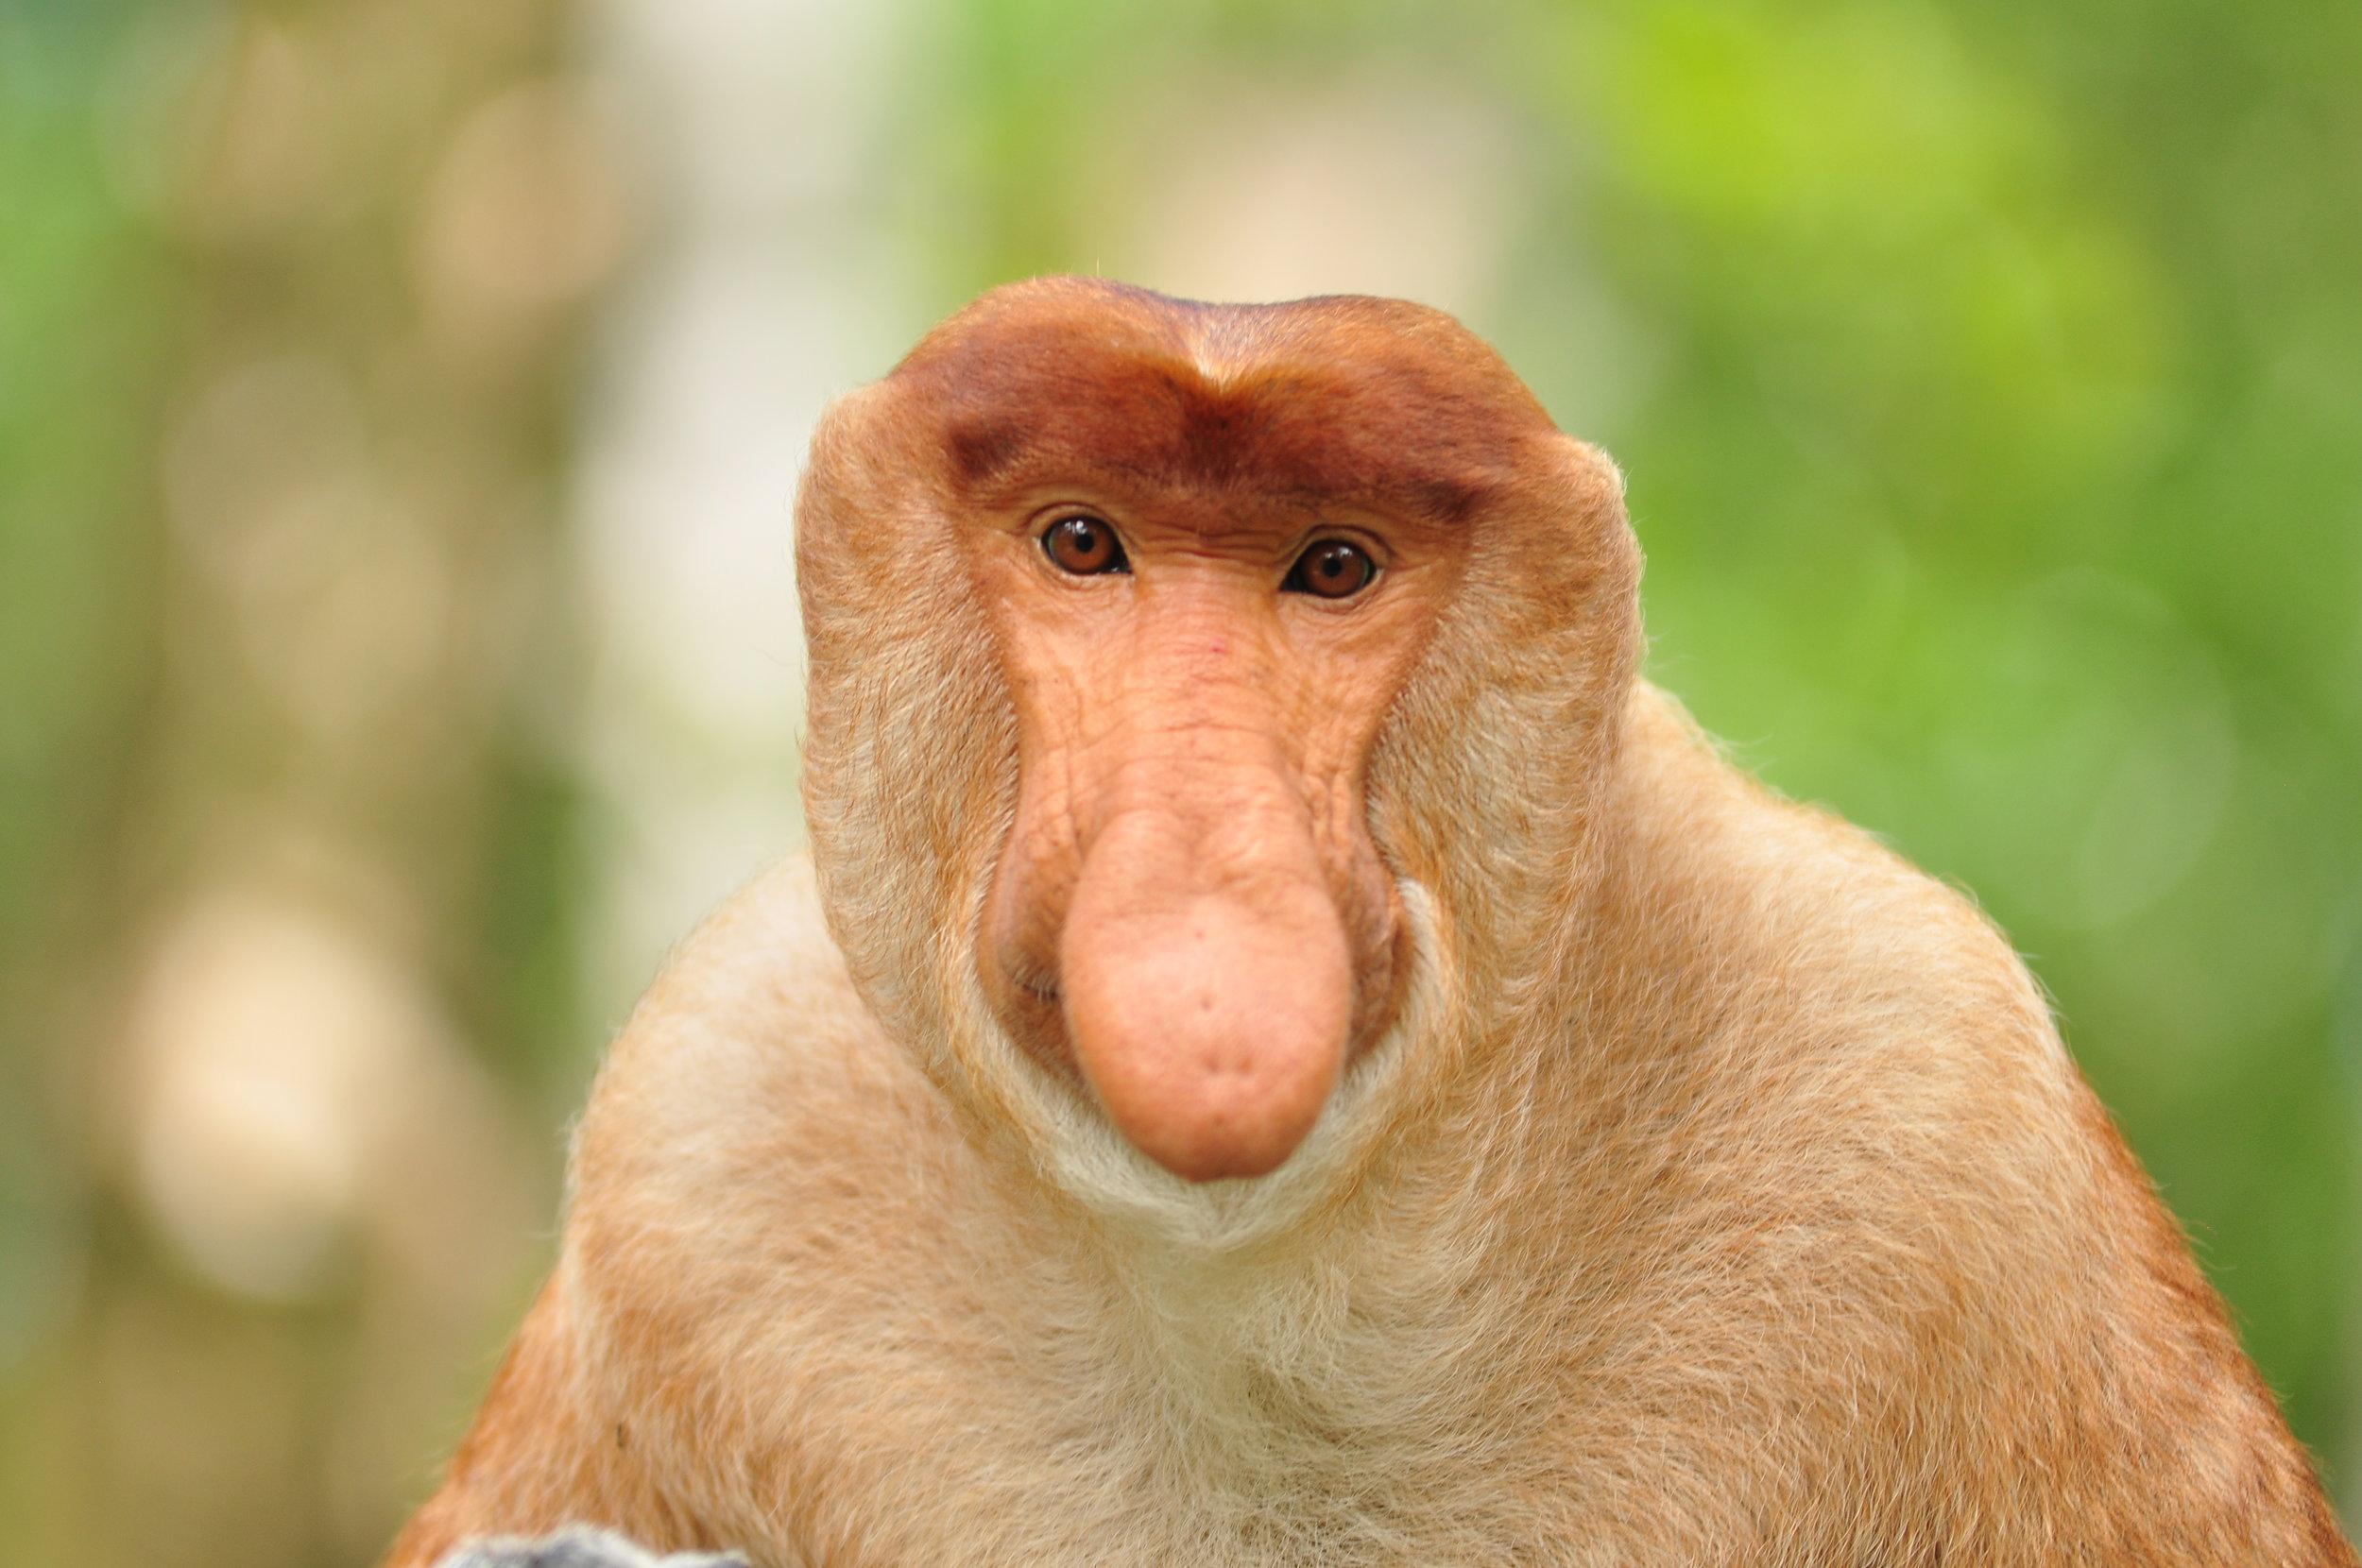 wildlife-mammal-fauna-primate-close-up-nose-1417140-pxhere.com.jpg